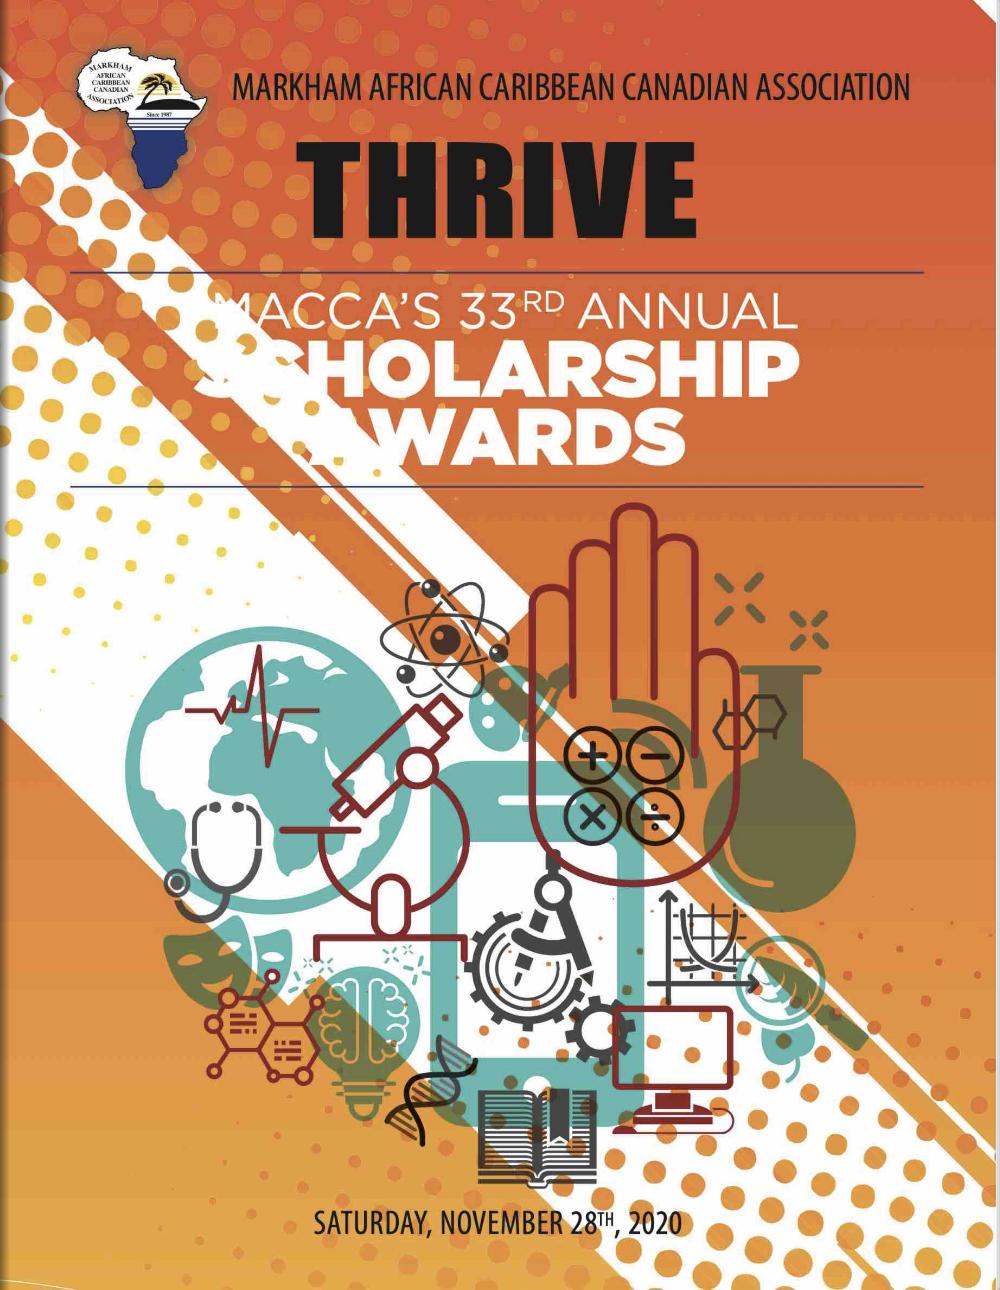 MACCA's 33RD Annual Scholarship Awards Flip Book